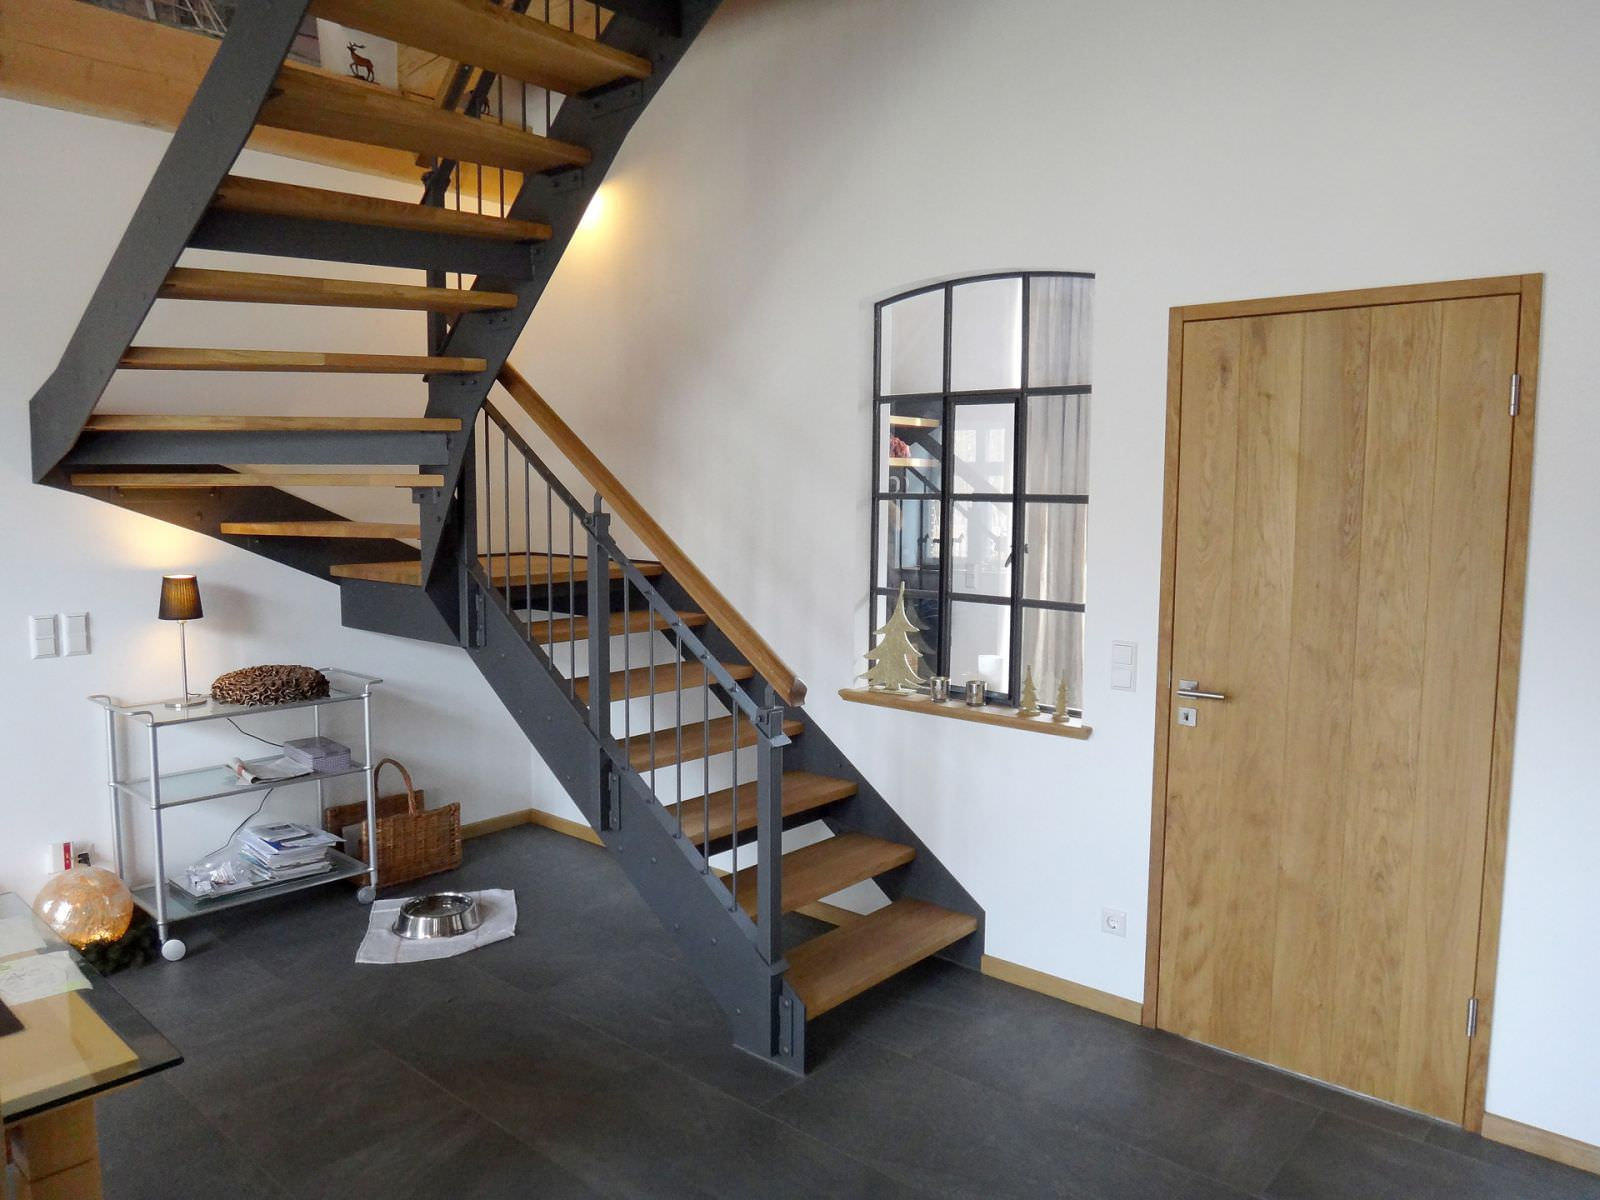 stahltreppen tischlerei lasse reckmann. Black Bedroom Furniture Sets. Home Design Ideas